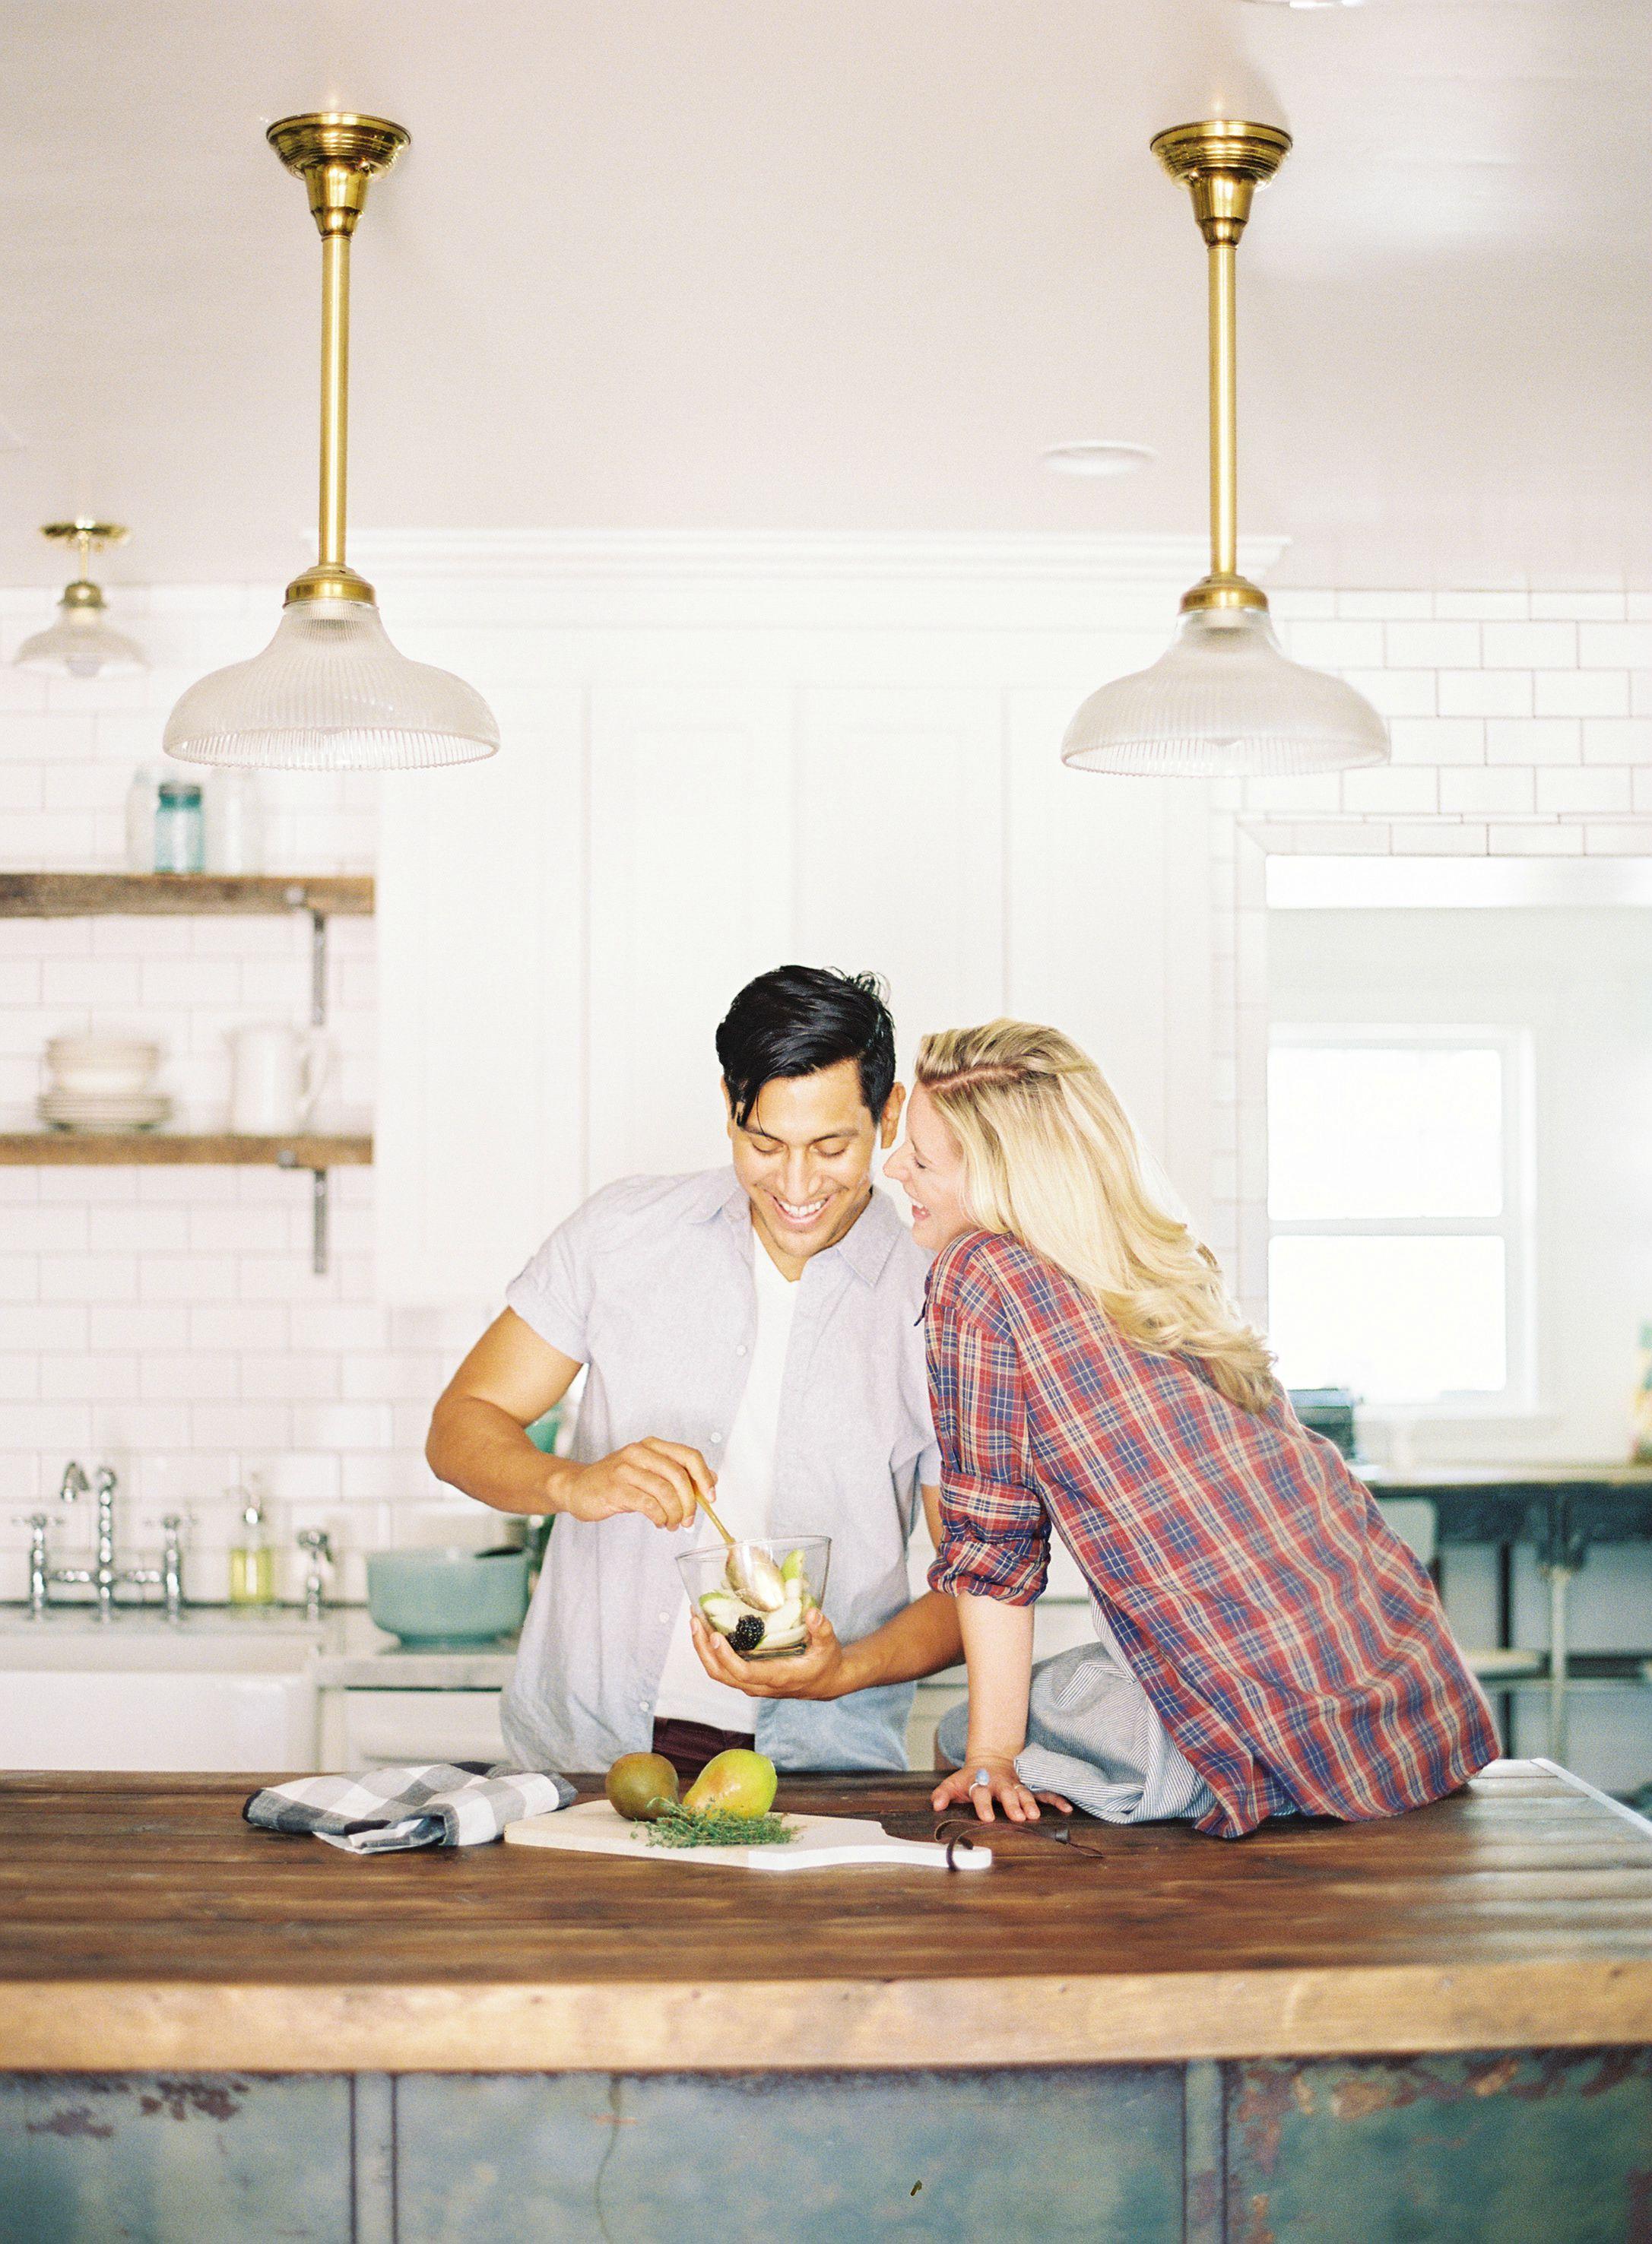 Kitchen Engagement Shoot Engagement couple, Alternative